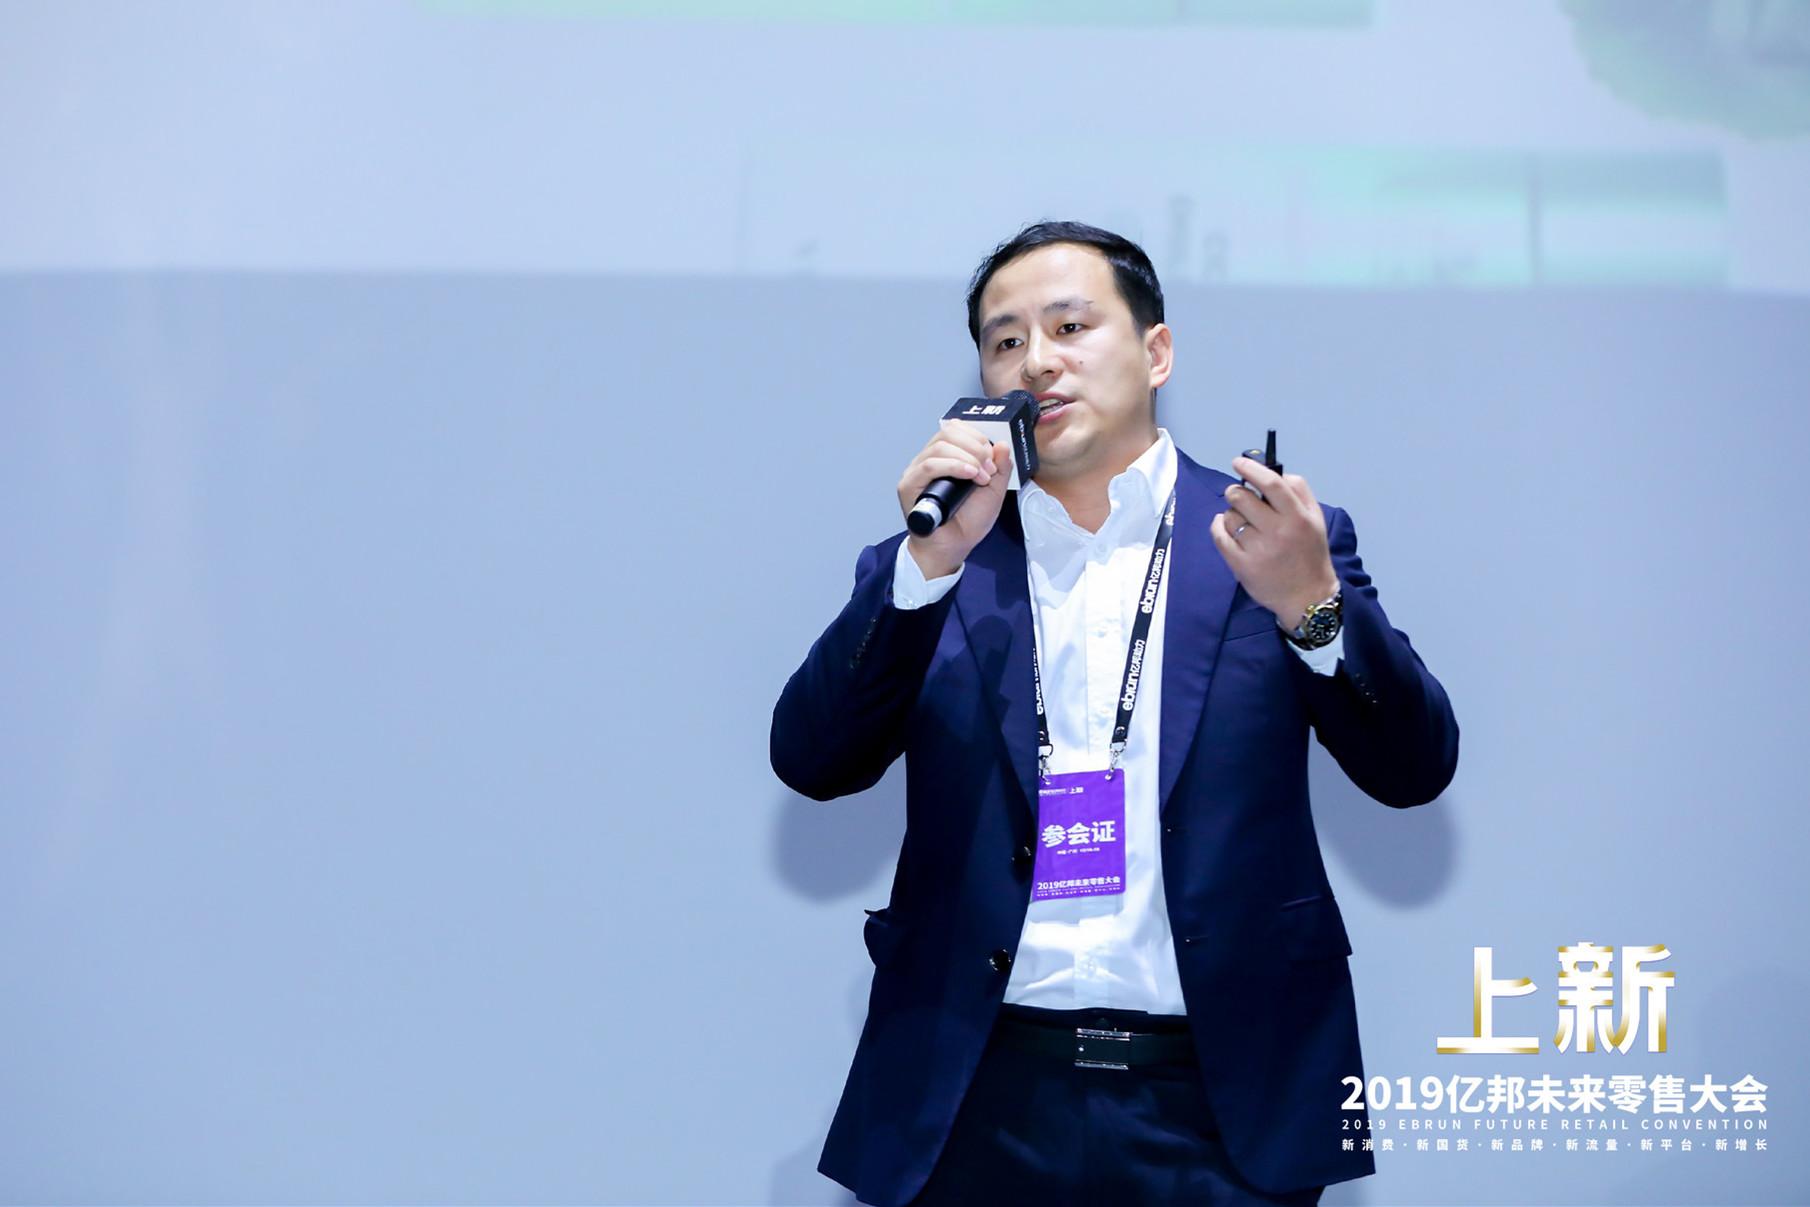 VT美妆中国区合伙人华玉峰:三步将GMV从2000万增至3亿